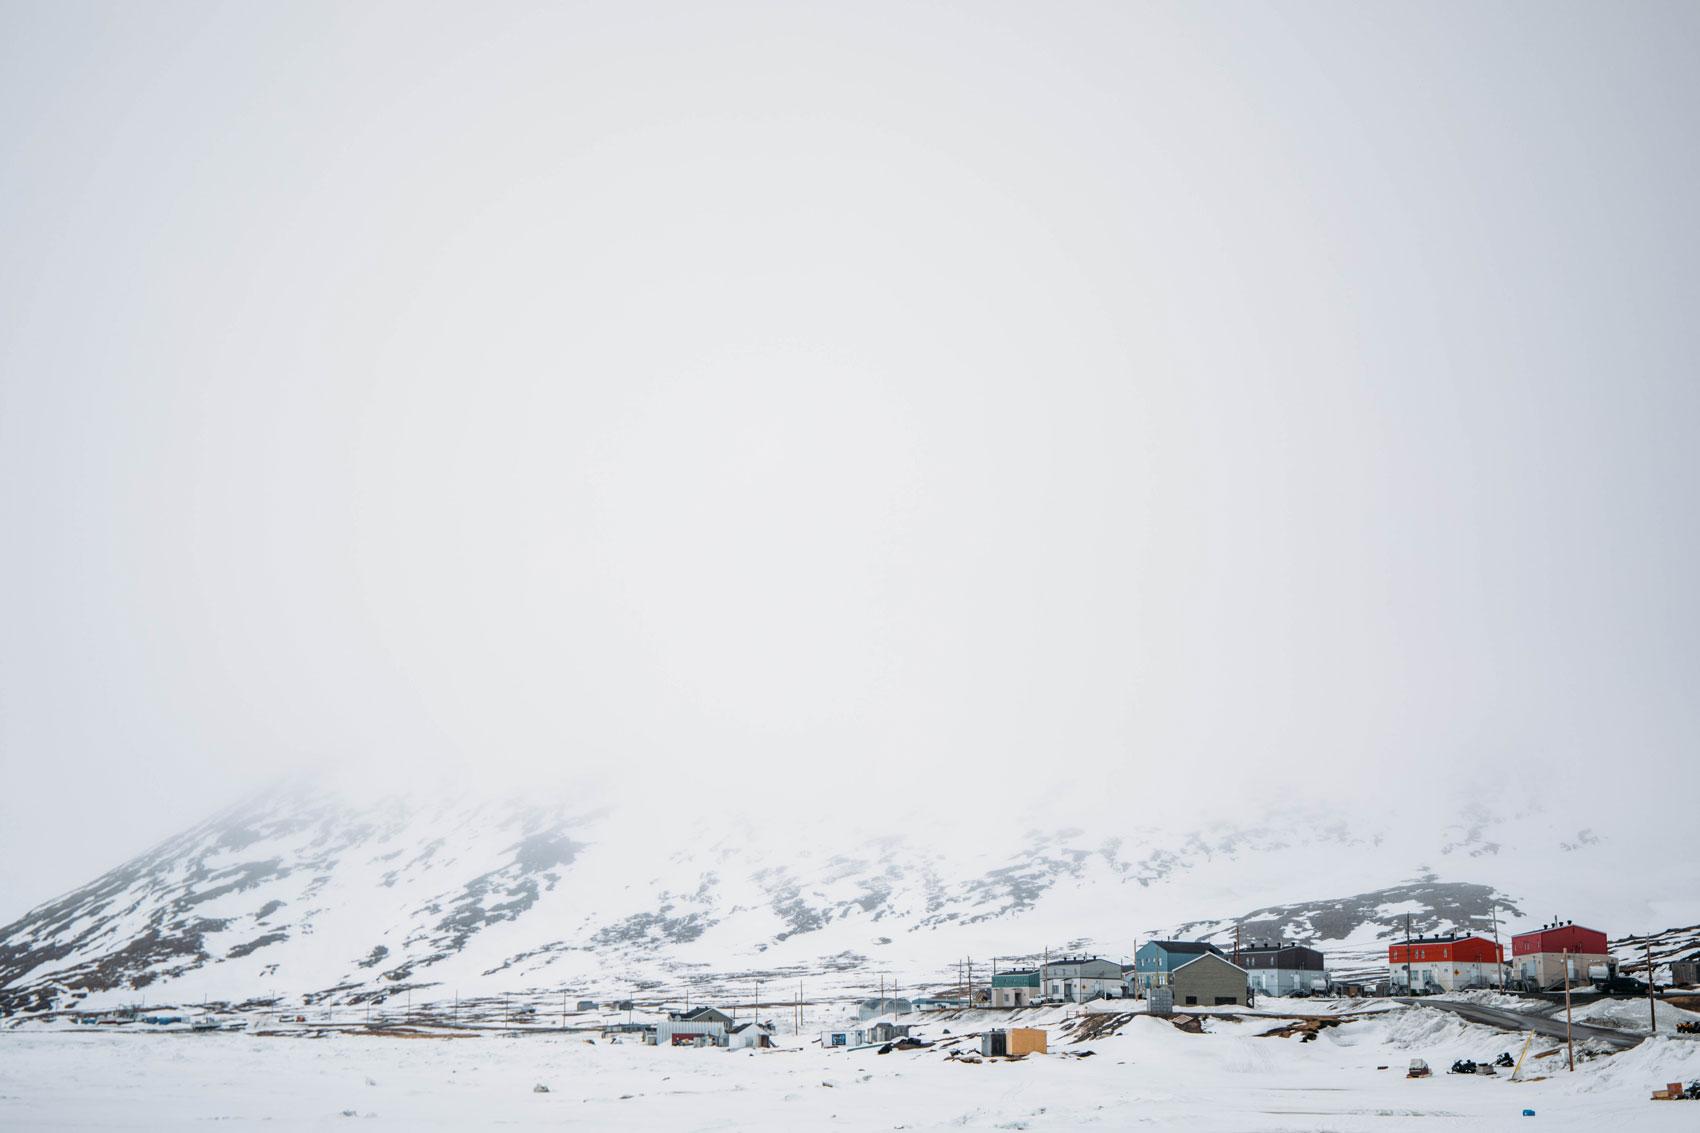 Kangiqsujuaq communauté inuite du Québec